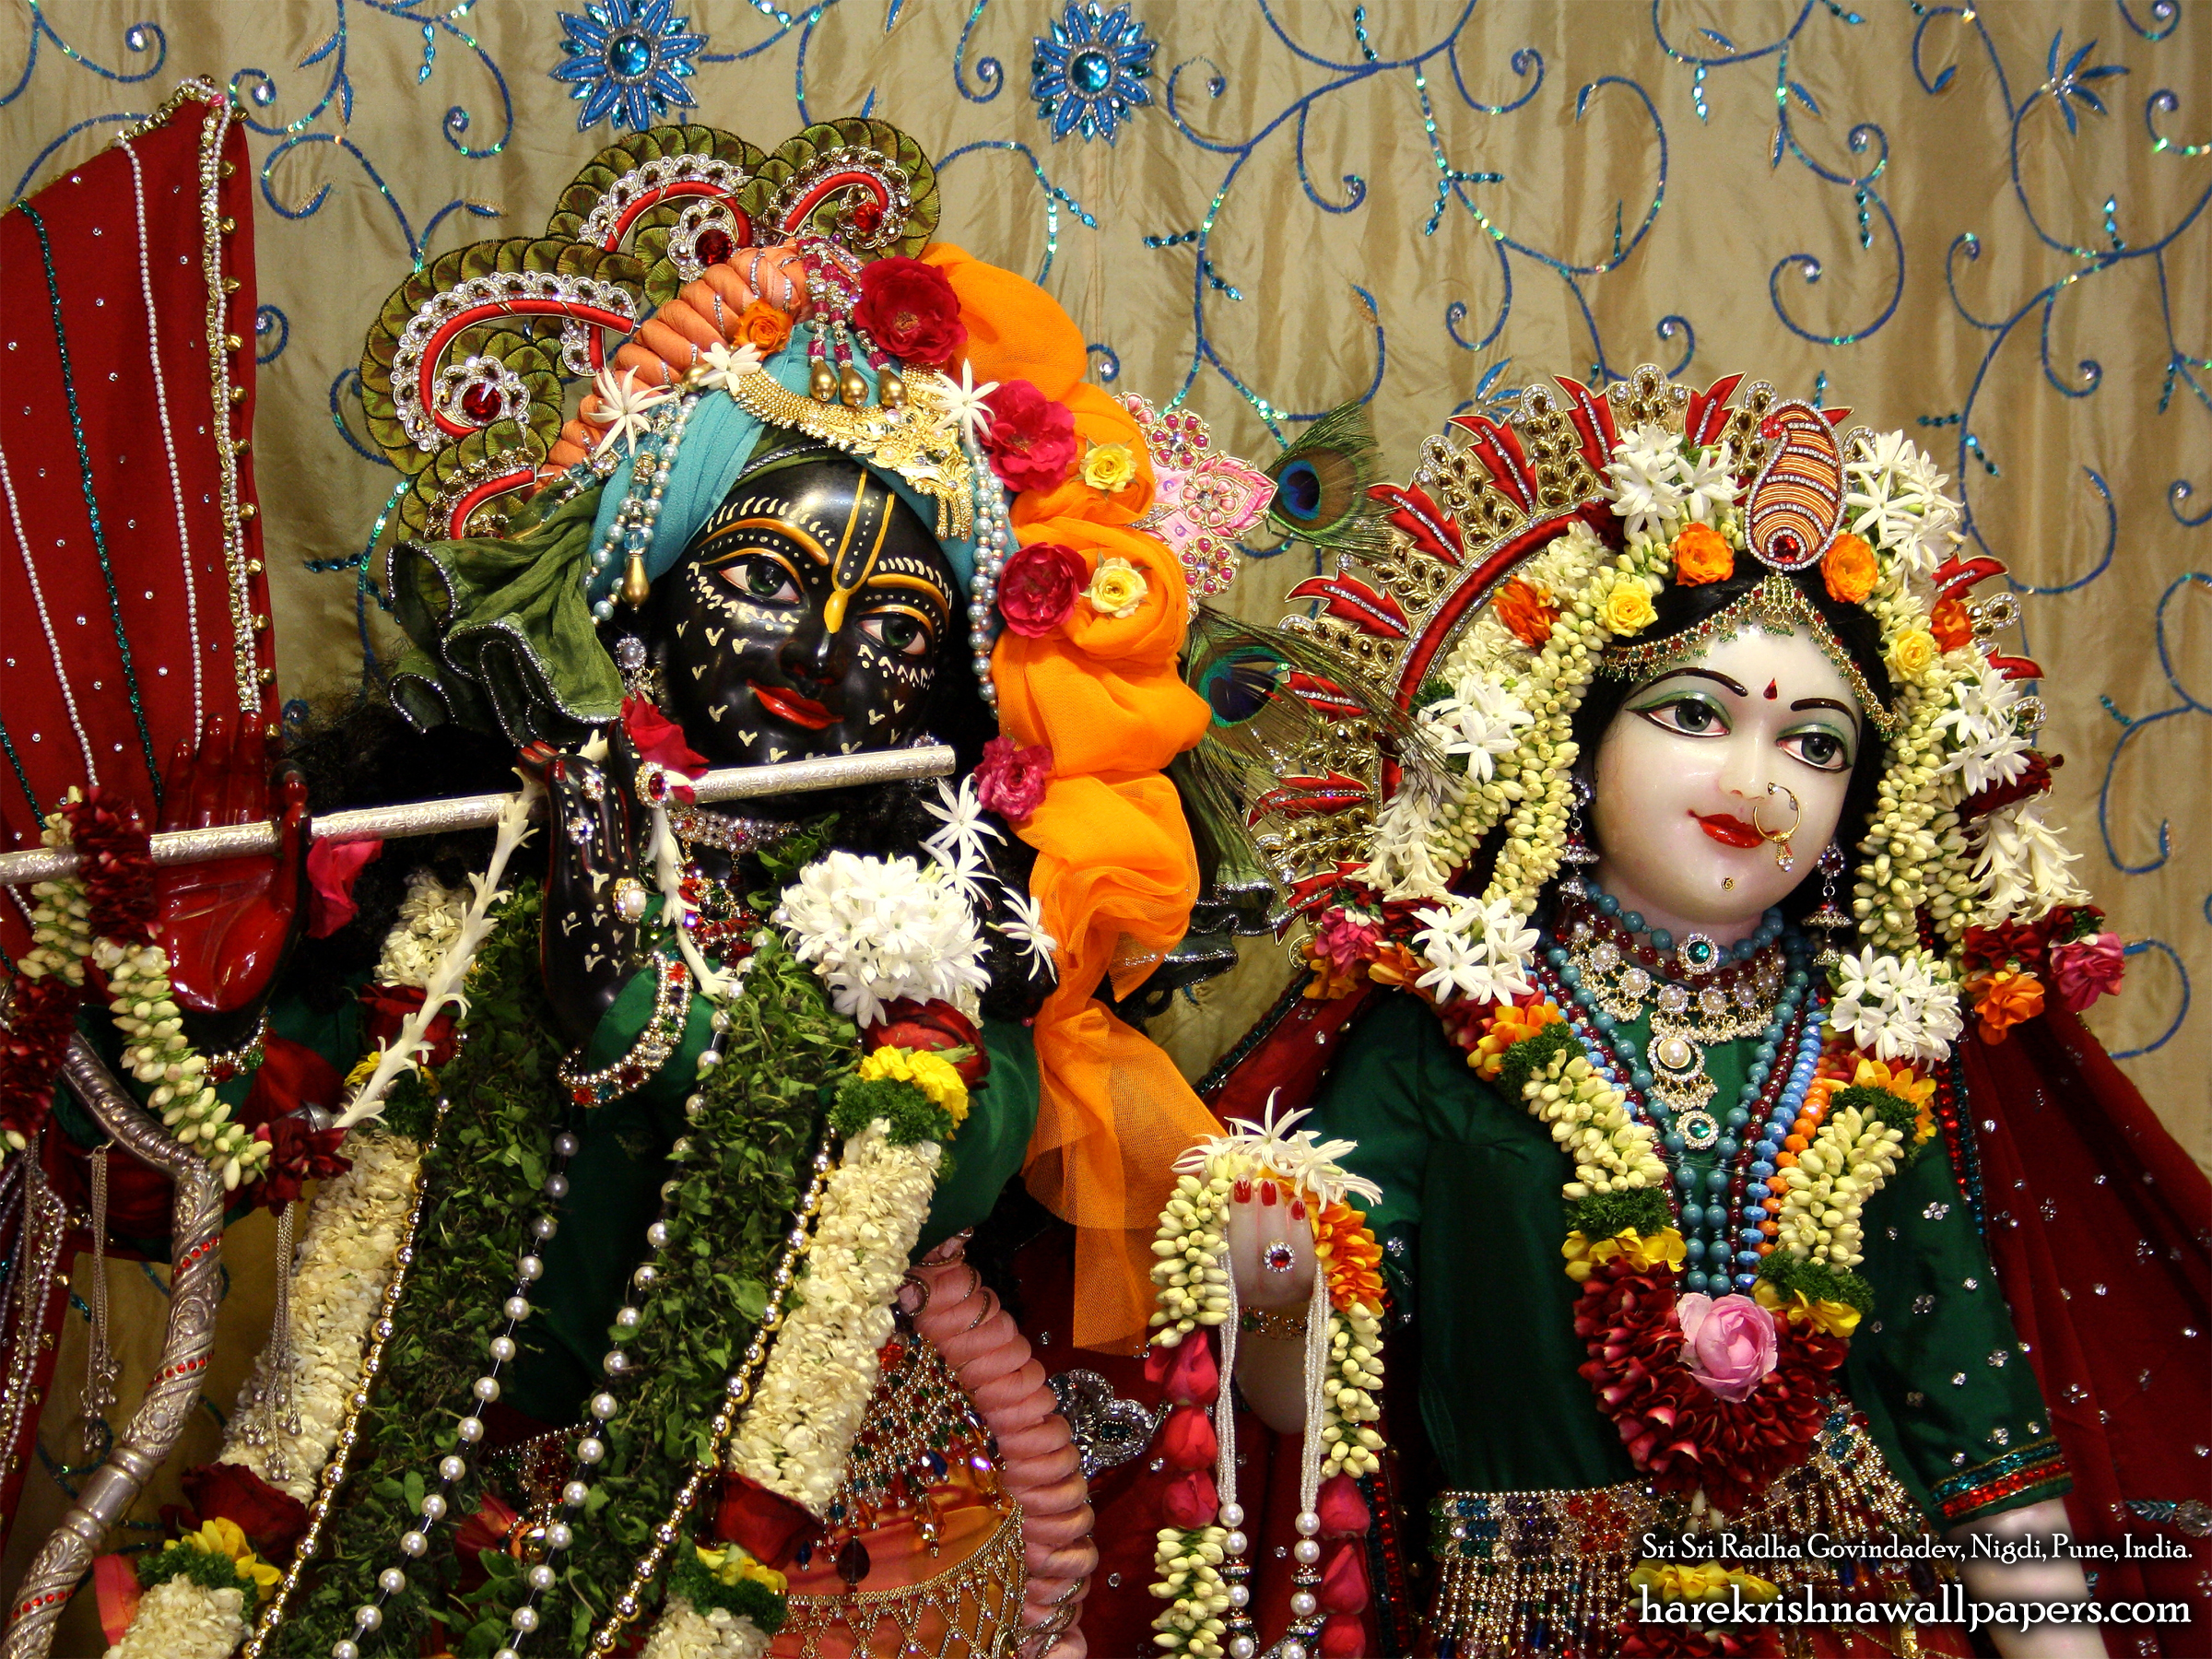 Sri Sri Radha Govind Close up Wallpaper (006) Size 2400x1800 Download